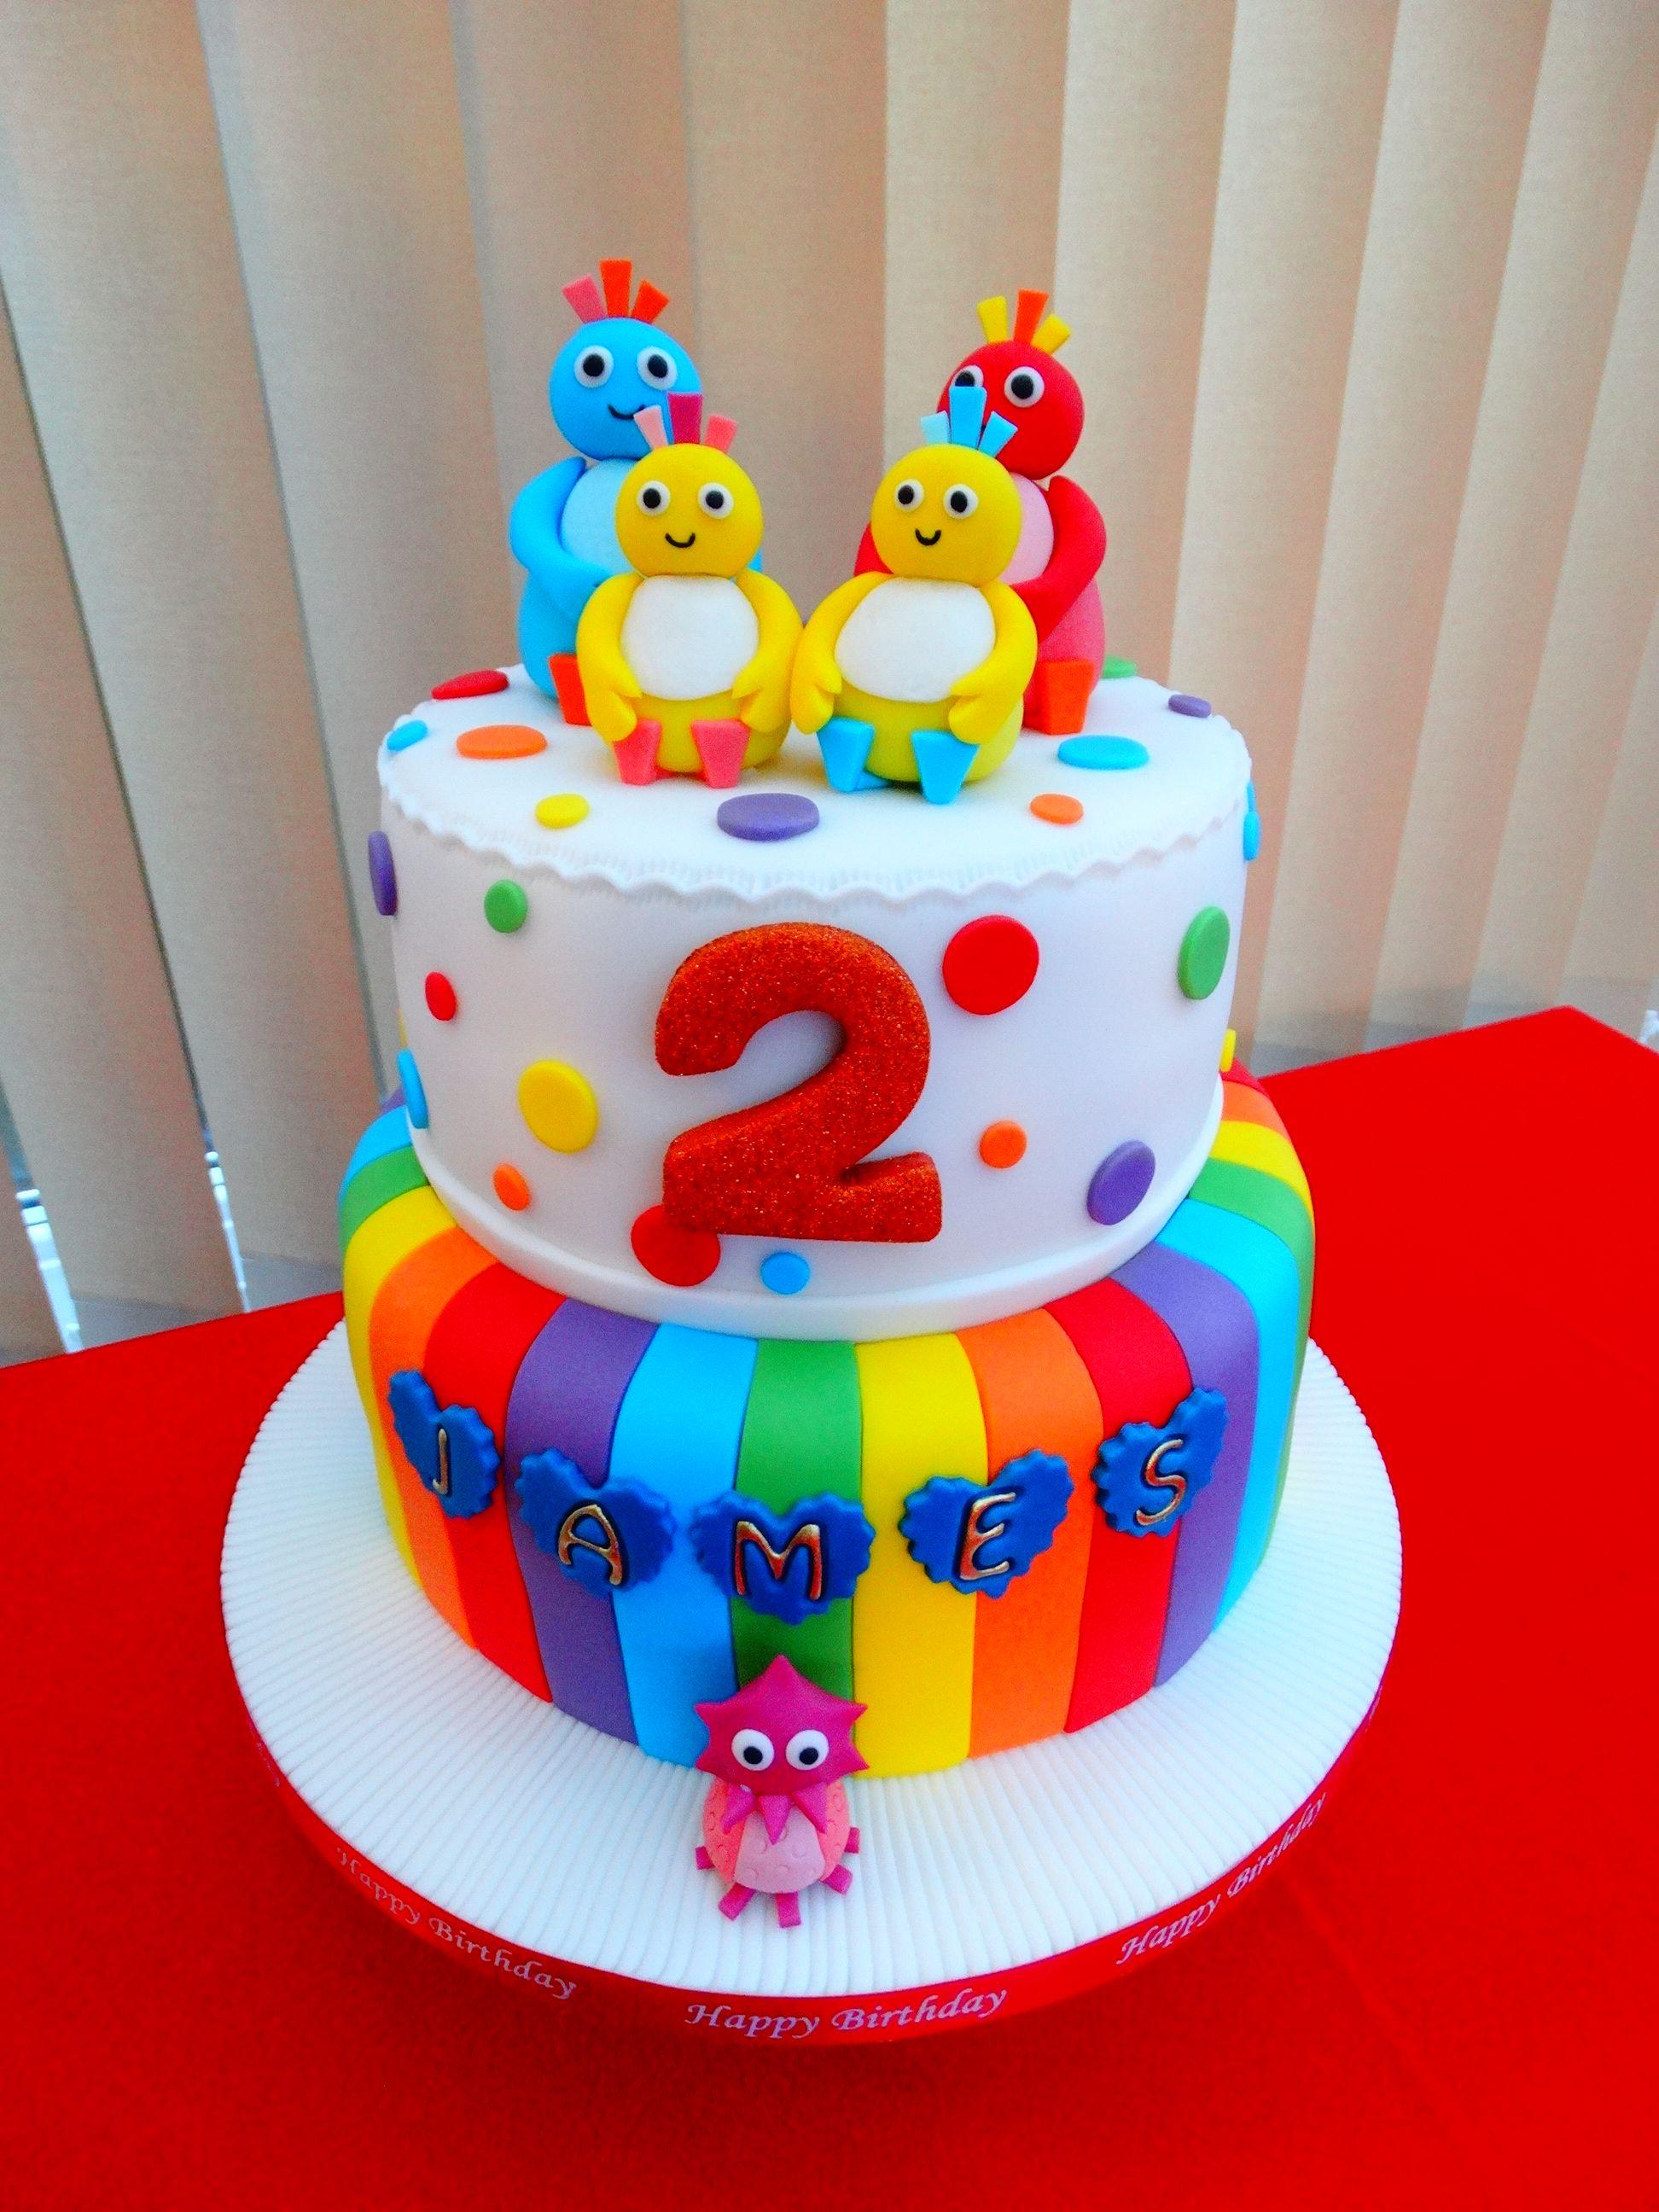 Twirlywoos Cake Xmcx Twirlywoos Cake First Birthday Cakes 2